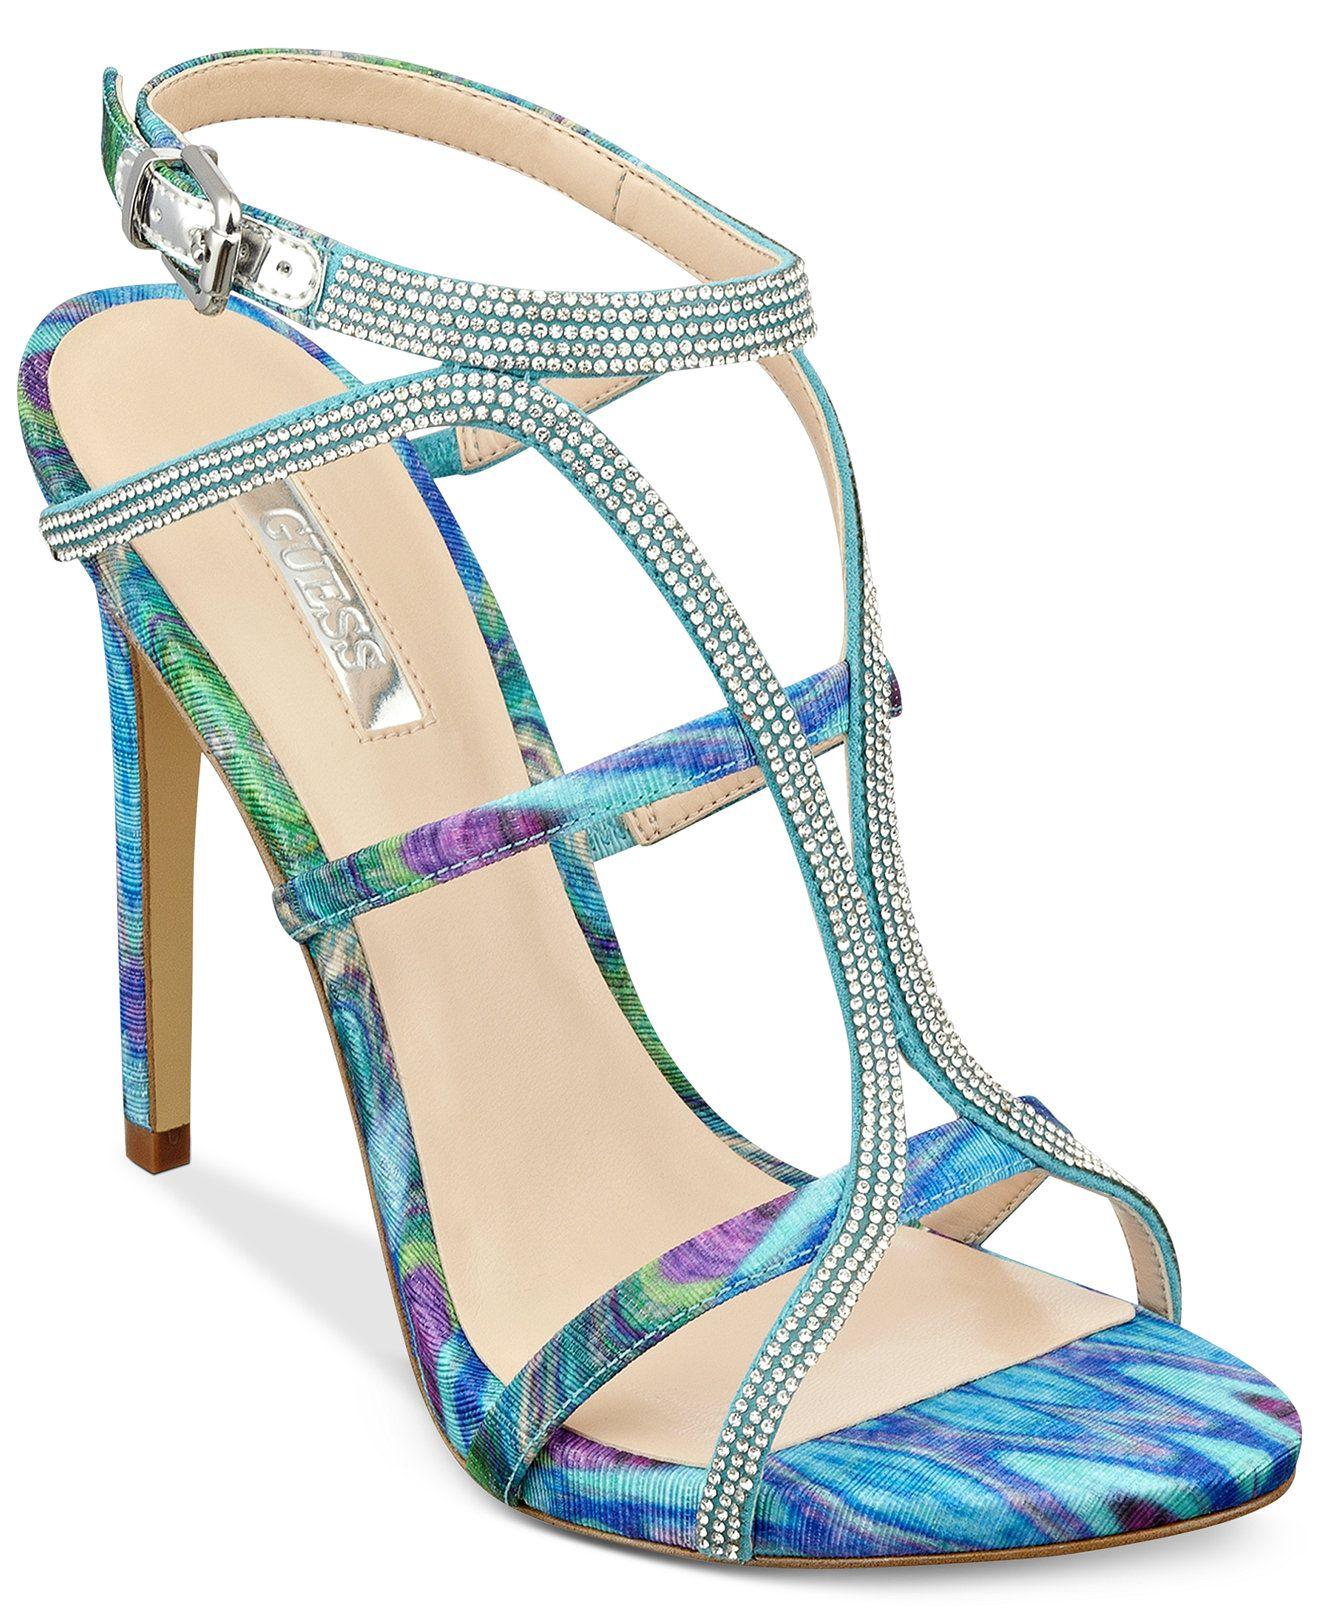 GUESS Women's Adalee Rhinestone Dress Sandals - Sandals - Shoes - Macy's - GUESS Women's Adalee Rhinestone Dress Sandals - Sandals - Shoes